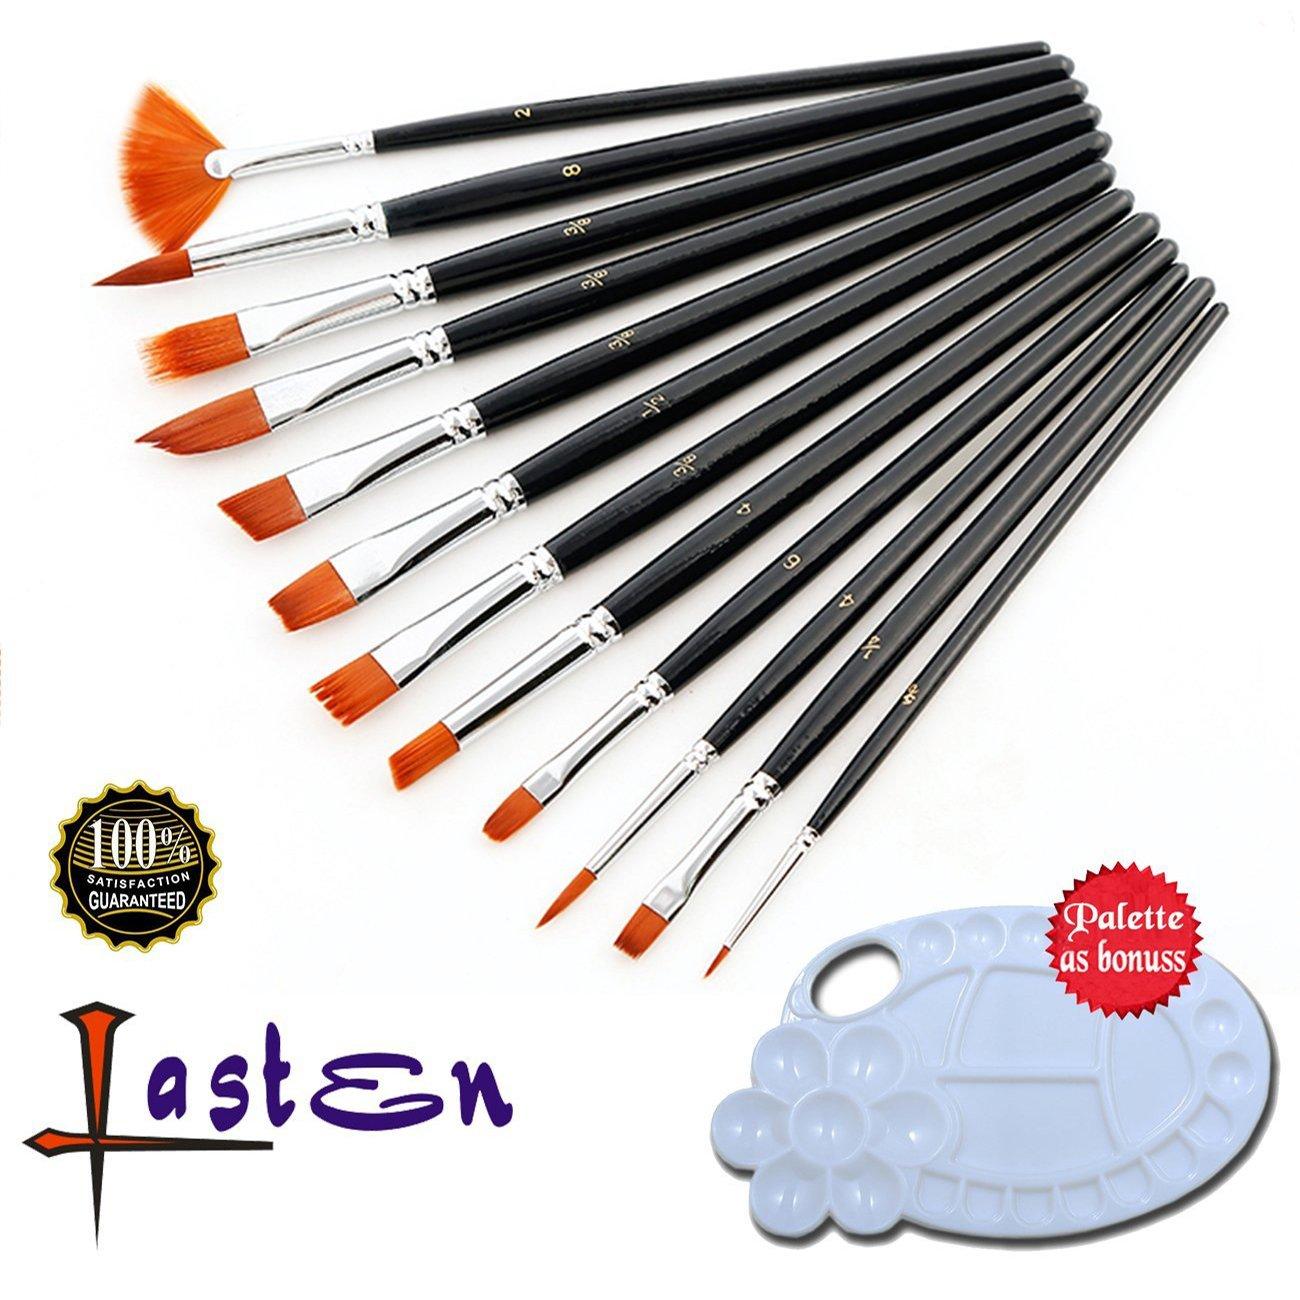 Lasten Paint Brush Set, Professional Paint Brushes Nylon Hair Artist Acrylic Brush for Watercolor Oil Acrylic Gouache Painting(12 pcs/set)